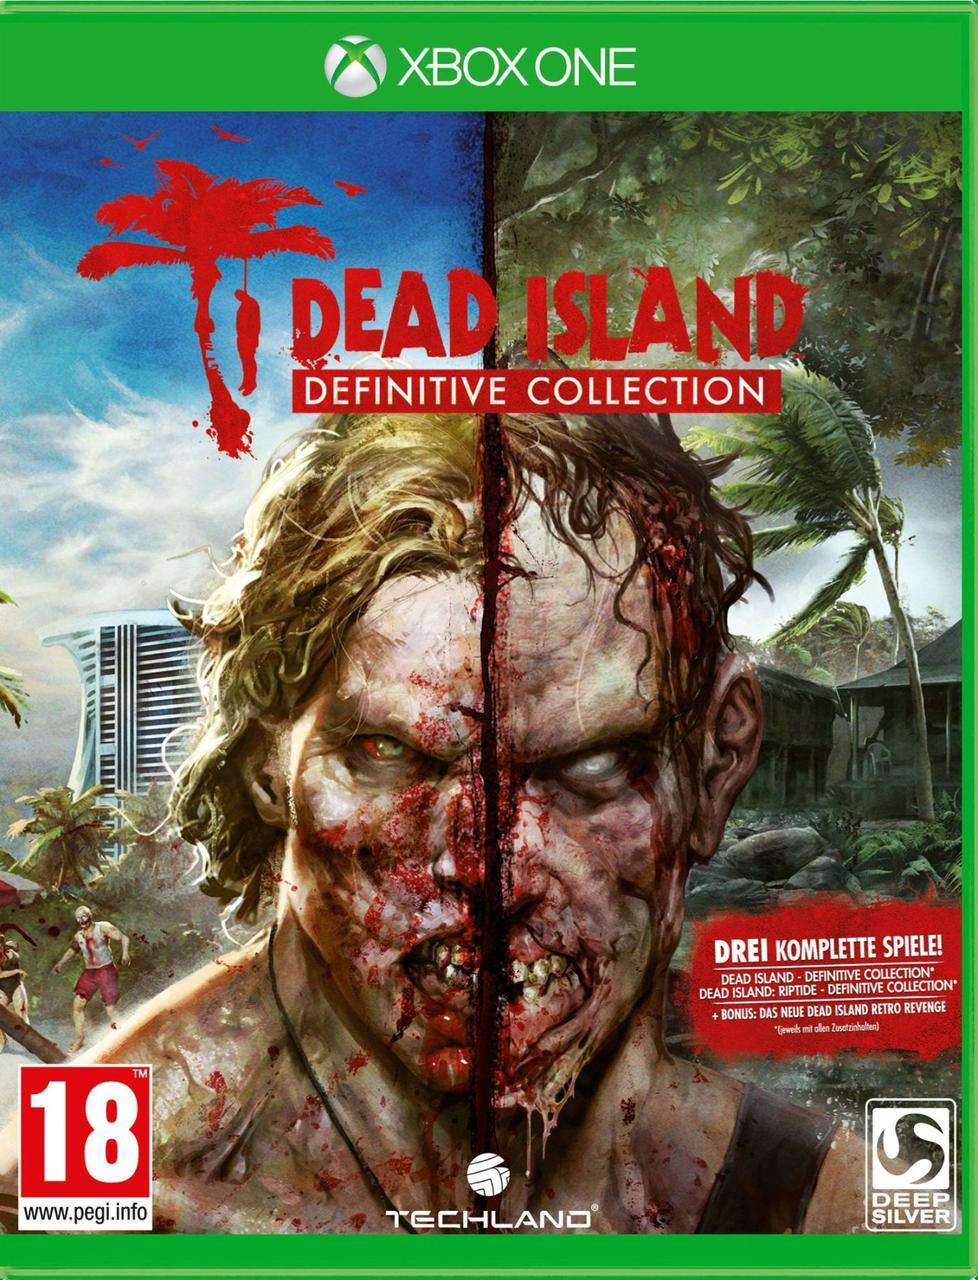 Dead Island Definitive Collection (російські субтитри) Xbox One